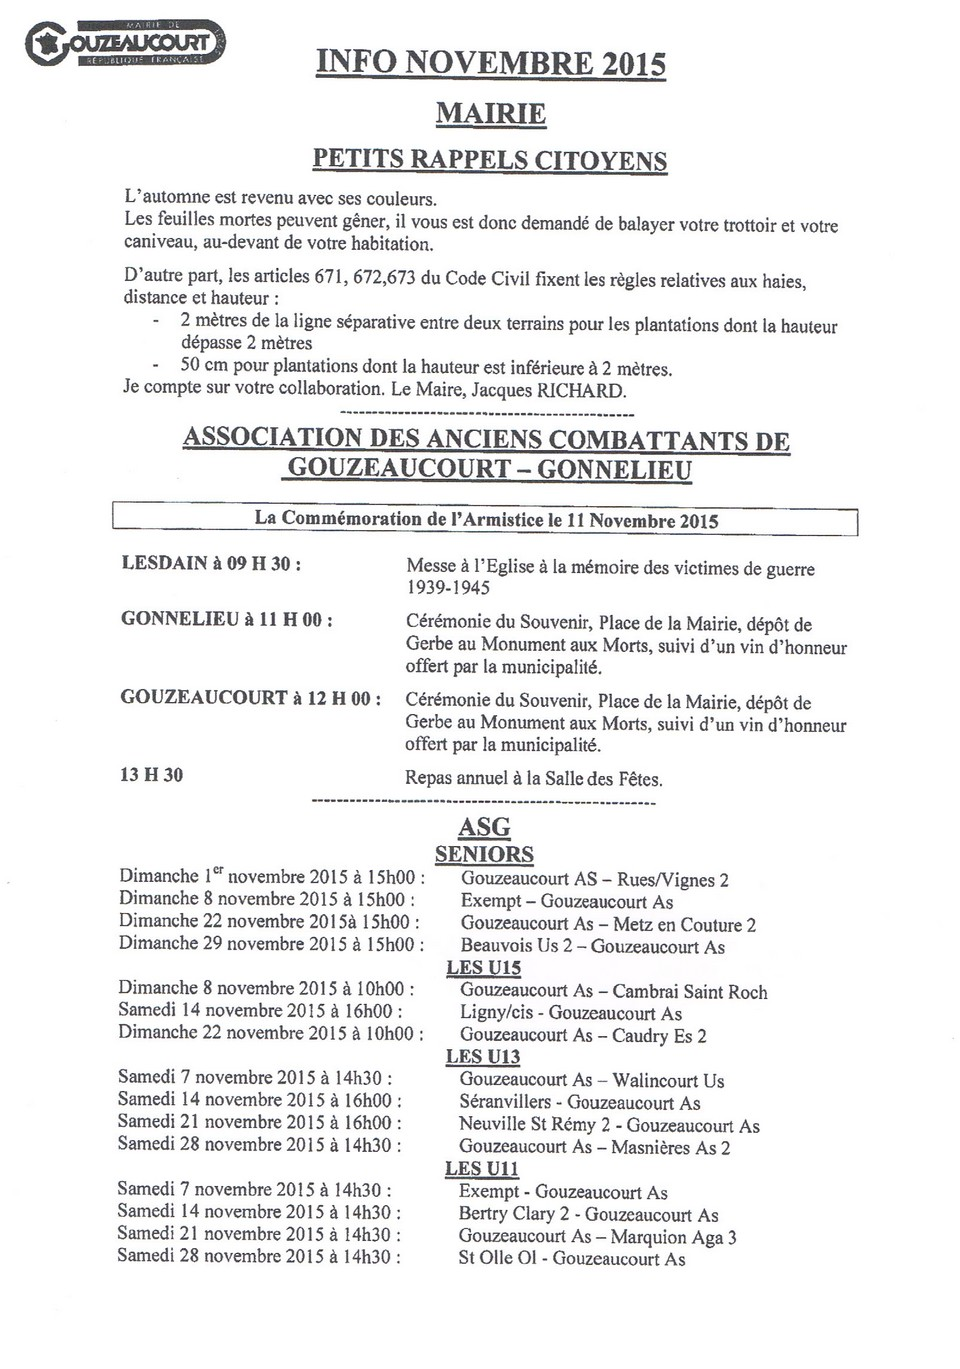 info nov 2015-1